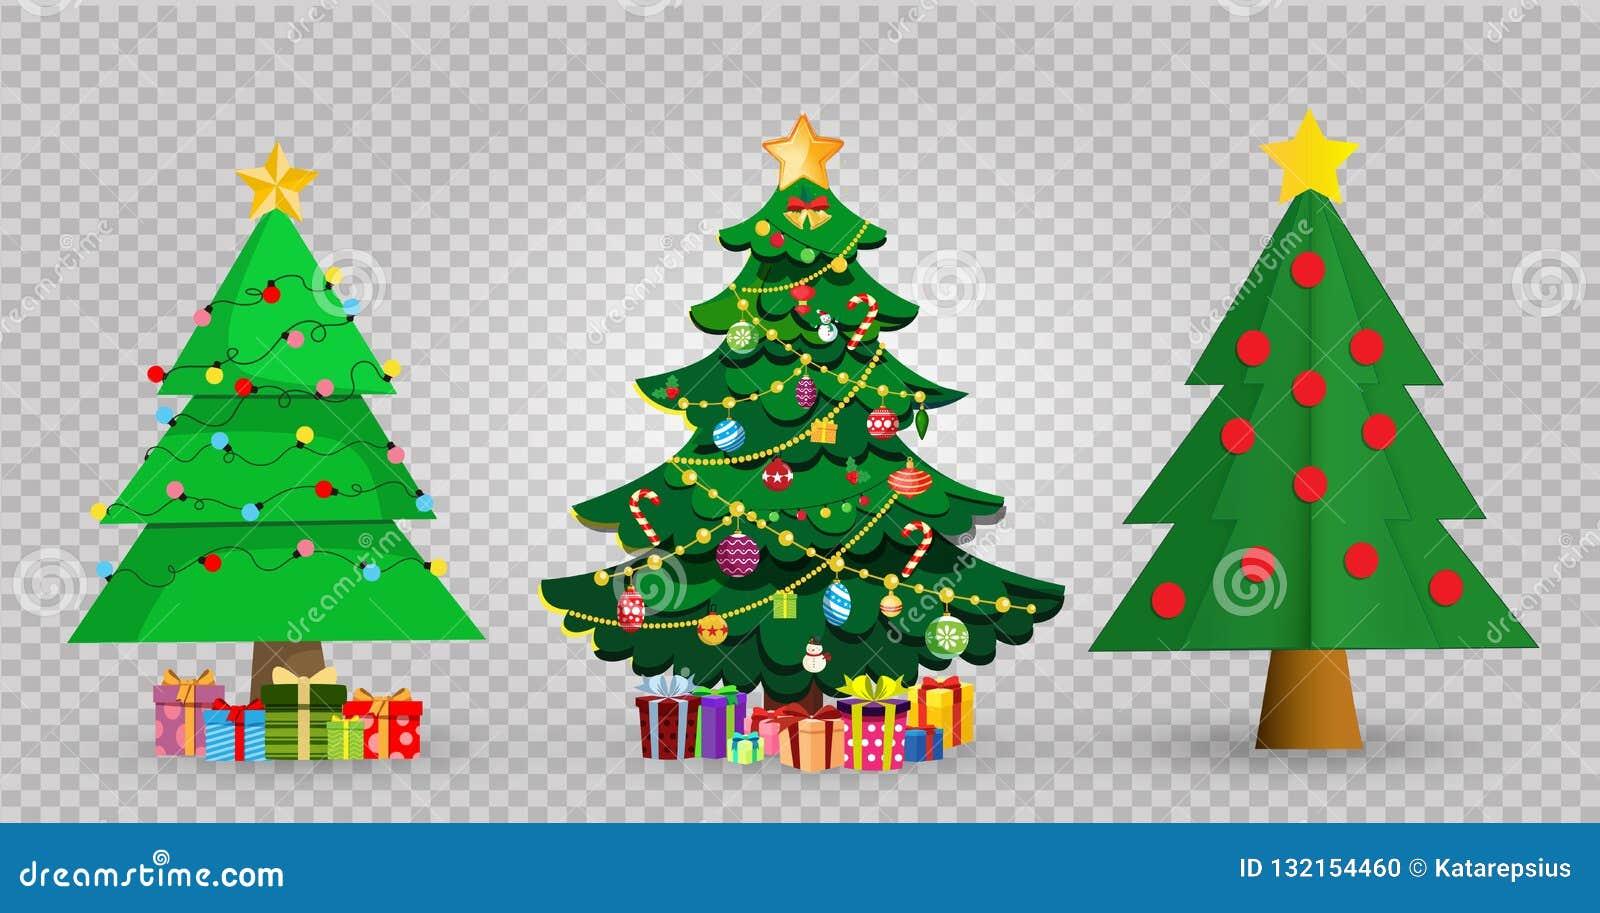 Christmas Tree Transparent Background.Set Of Cute Cartoon Christmas Fir Trees On Transparent